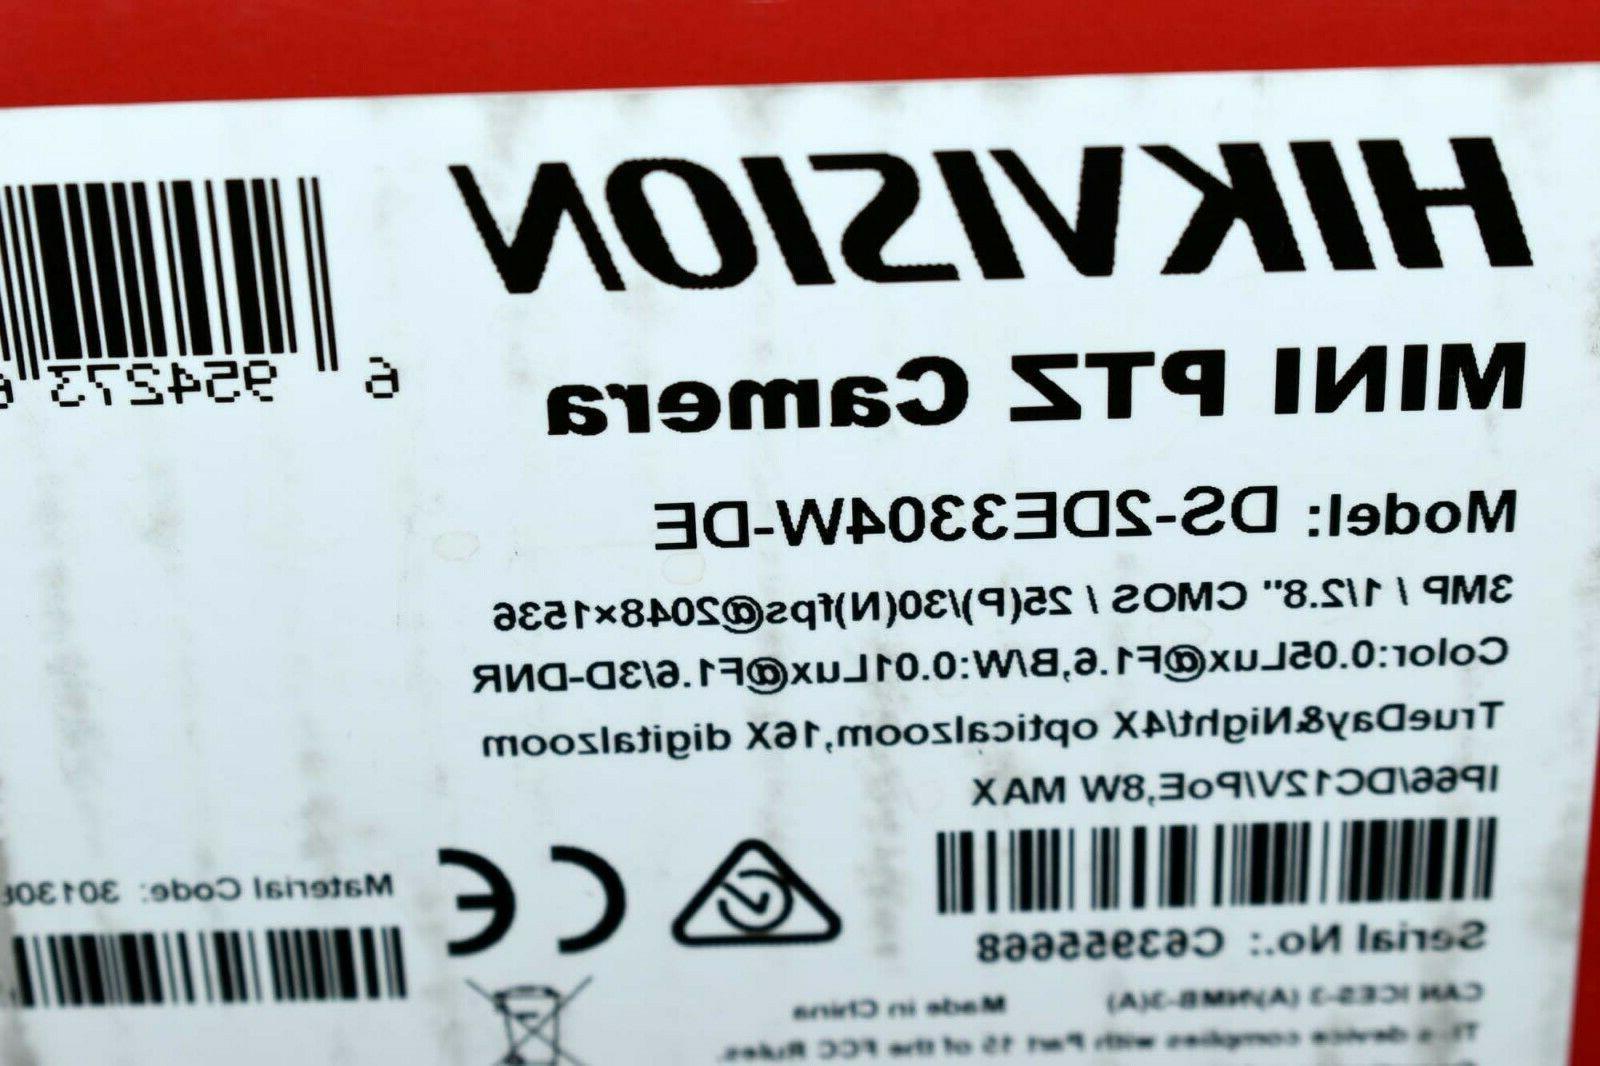 New DS-2DE3304W-DE 3MP Mini PTZ 4X Zoom Dome IP Camera